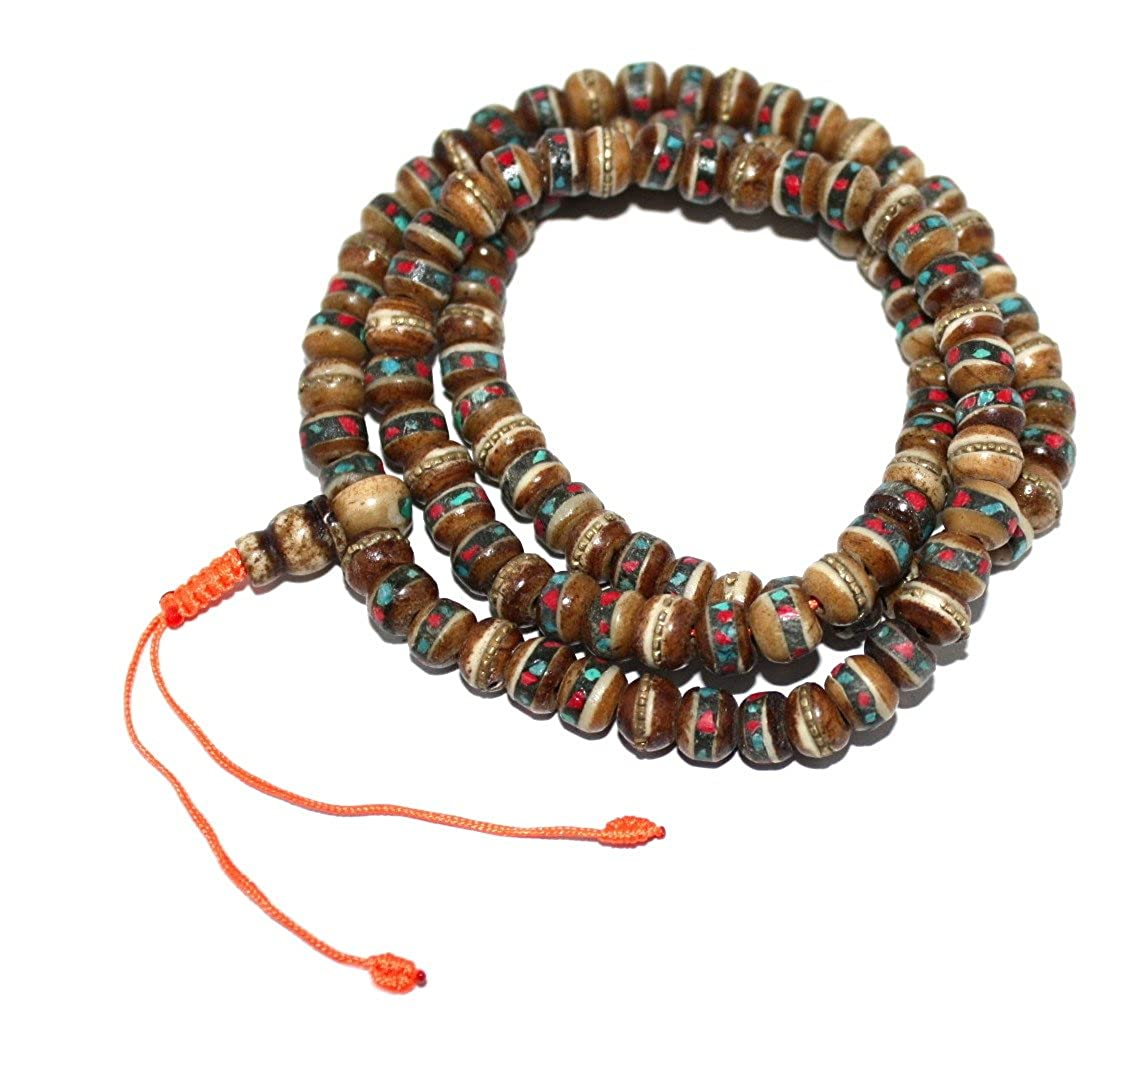 Amazon.com: Boho necklace Tibet Prayer beads Brown Tibetan ...